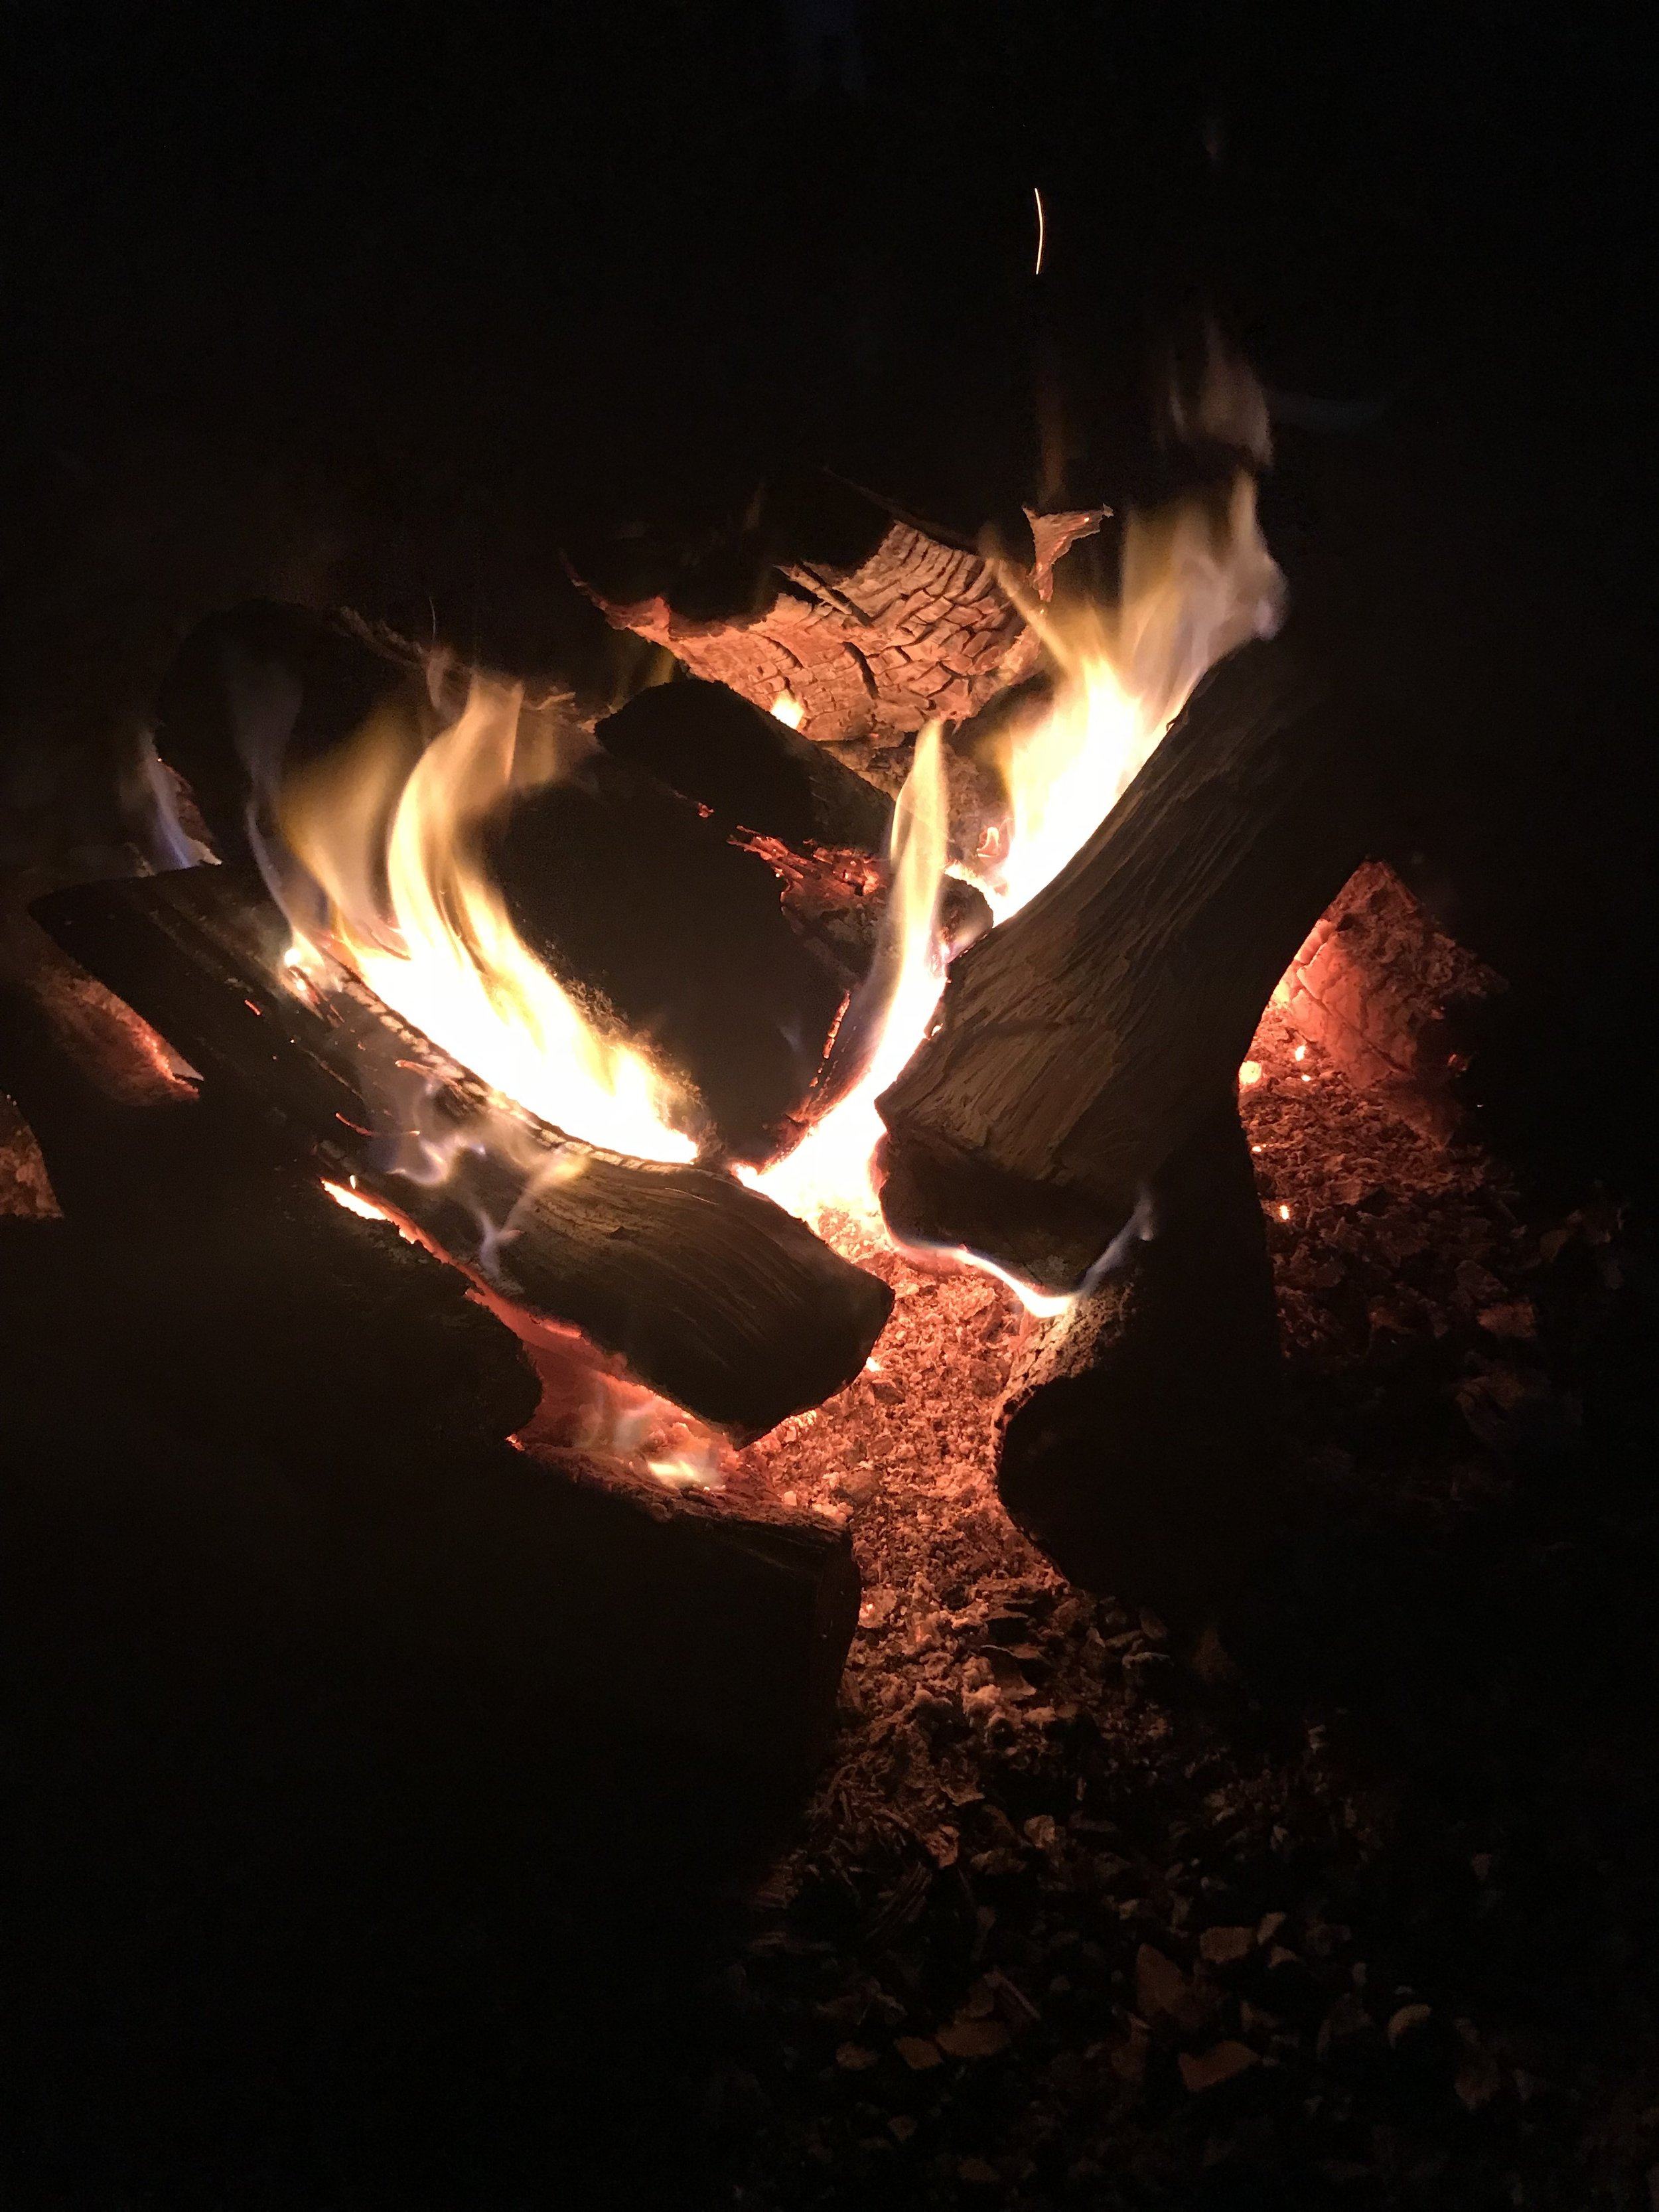 Bonfire Bay Tour Company - Stunning and memorable tours of Ketchikan.